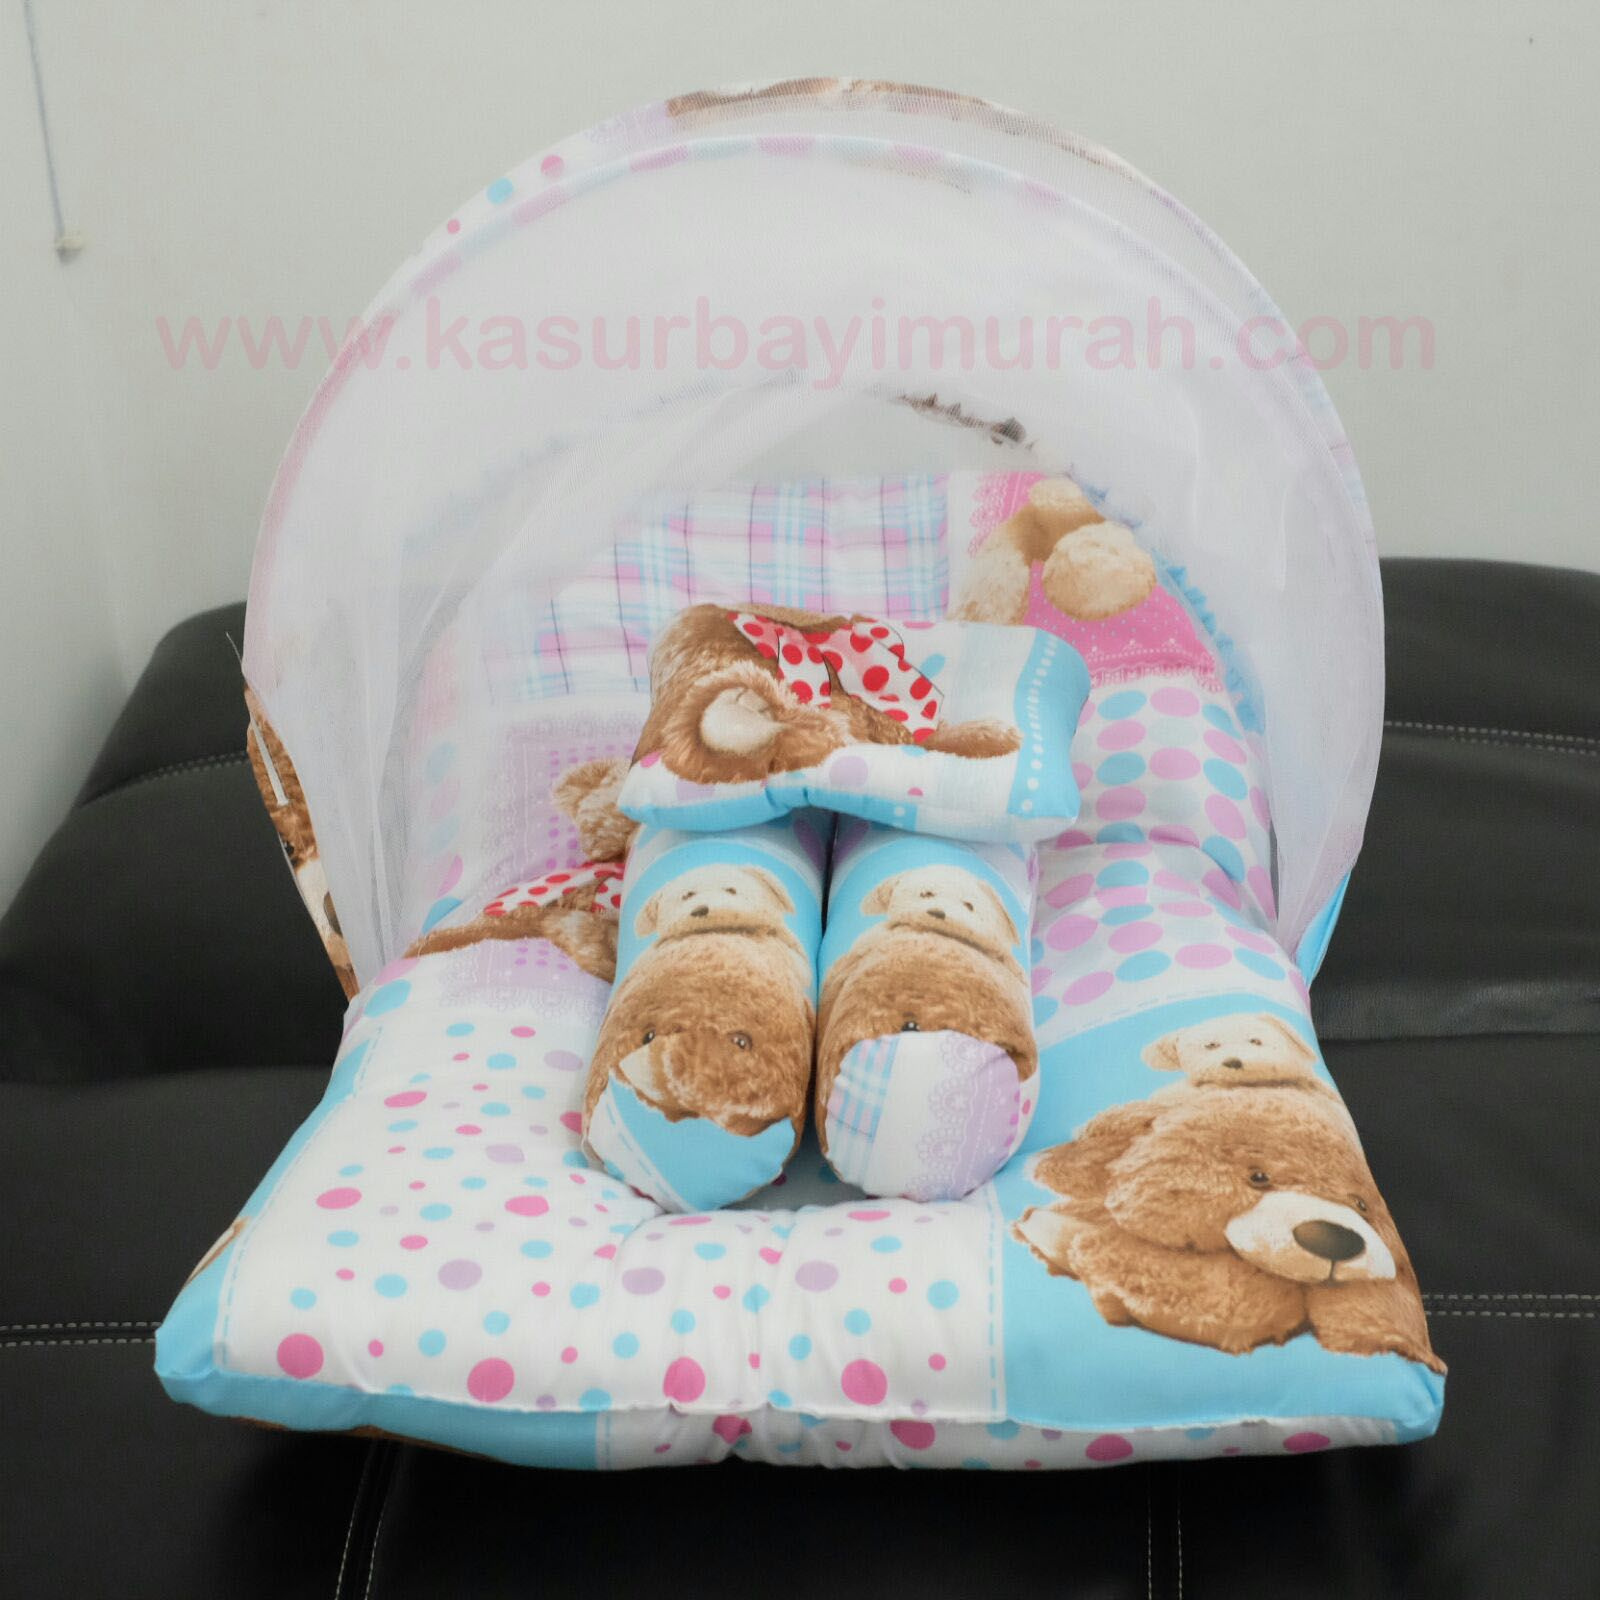 Kasur Bayi Kelambu Lipat Termurah Dan Tercepat Strategi Untuk